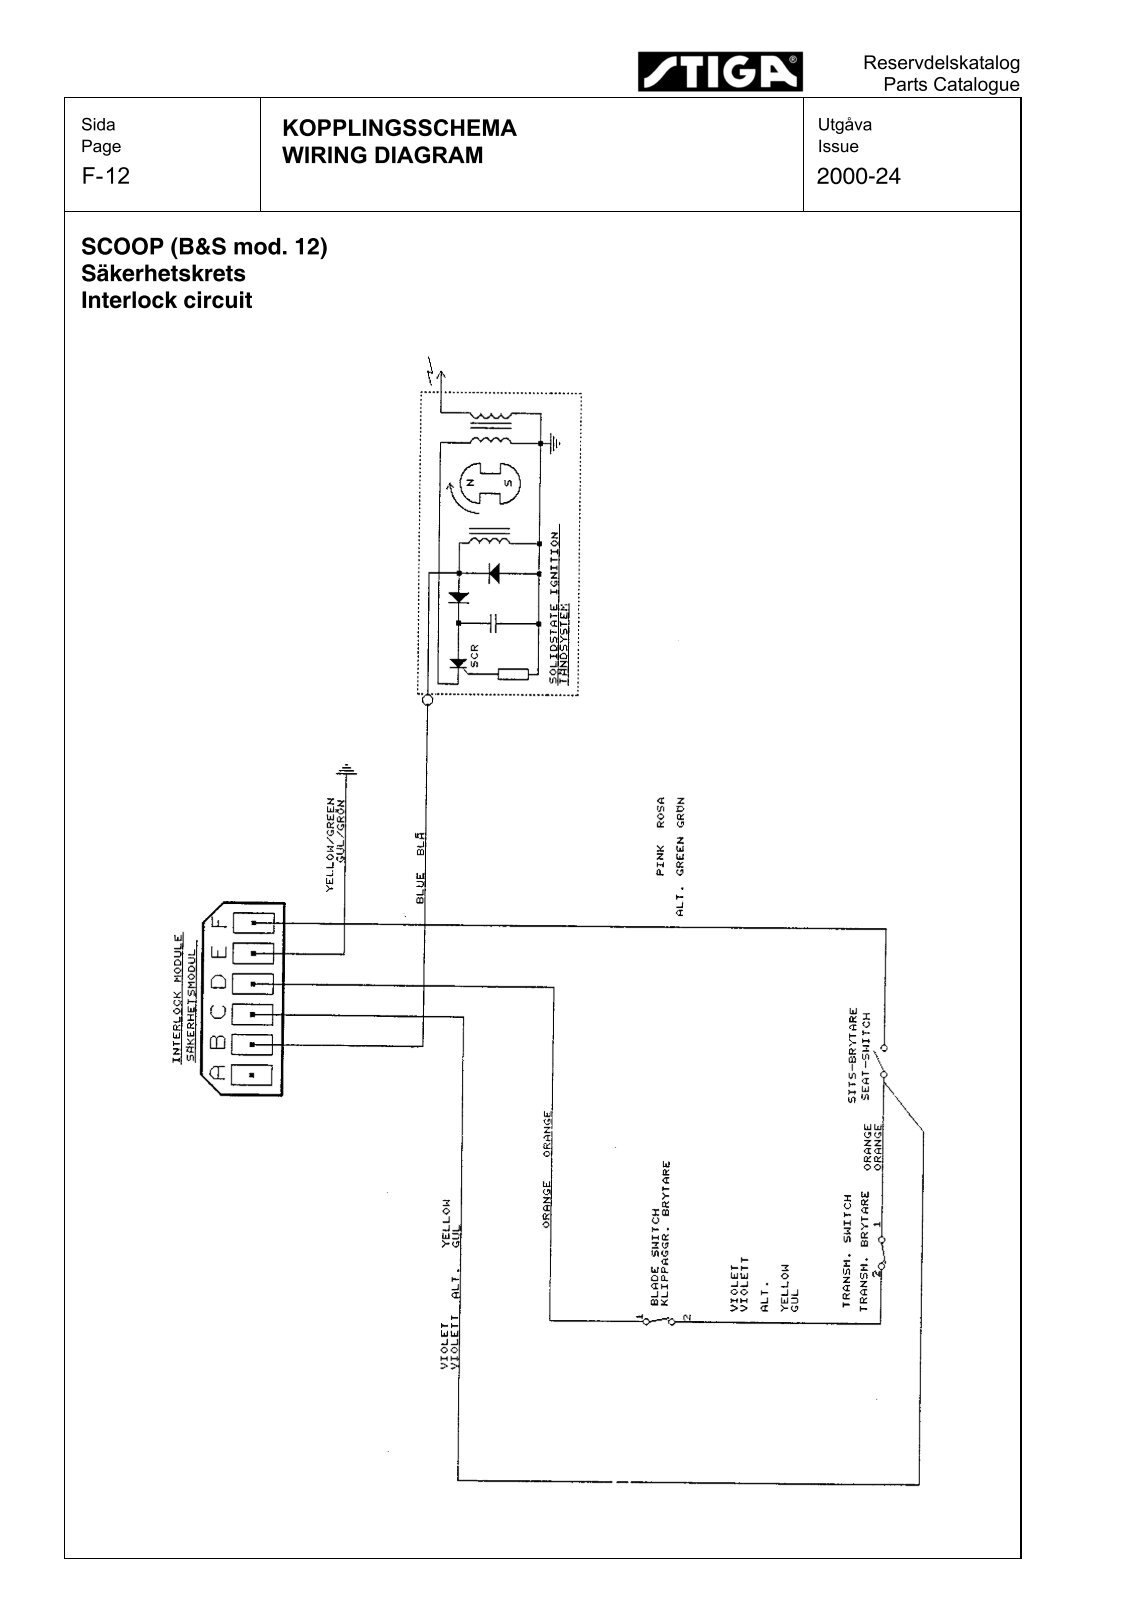 hight resolution of m1008 wiring diagram wiring schematics diagram rh wiring regdiy co 1984 cucv m1009 light diagram cucv alternator wiring